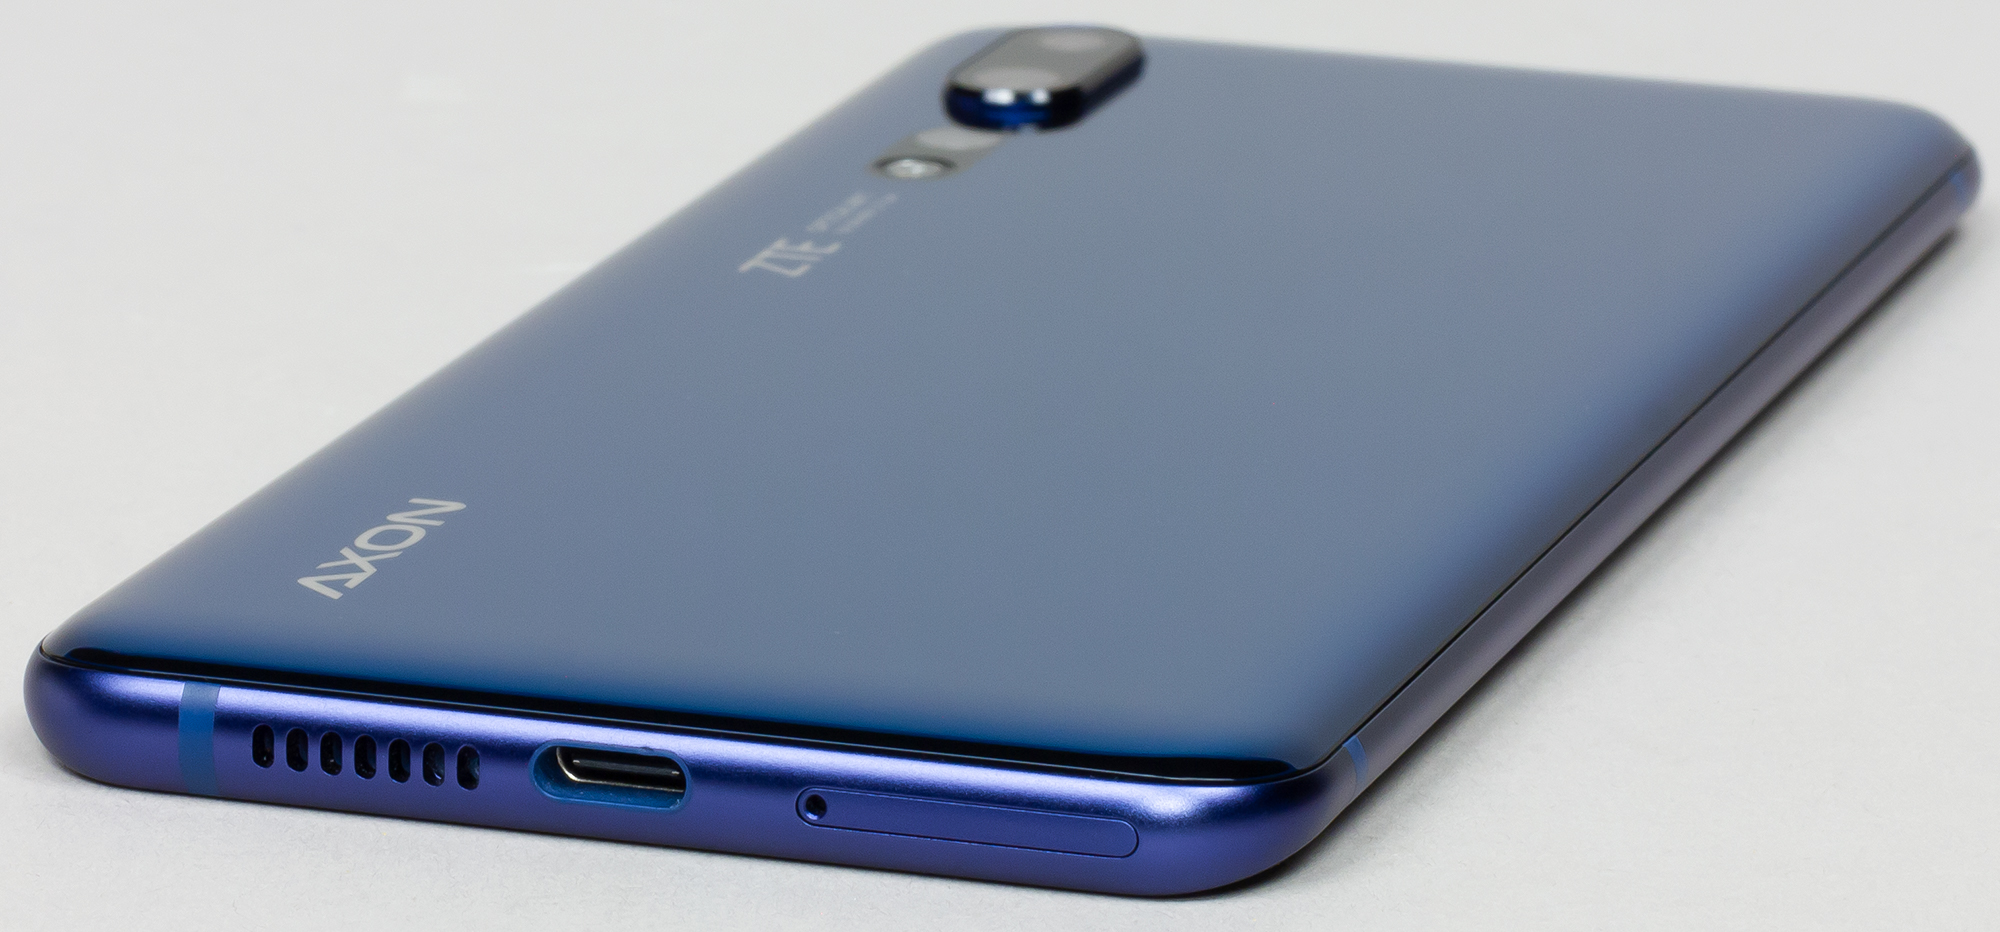 Выбор редакции смартфон zte axon 10 pro blue